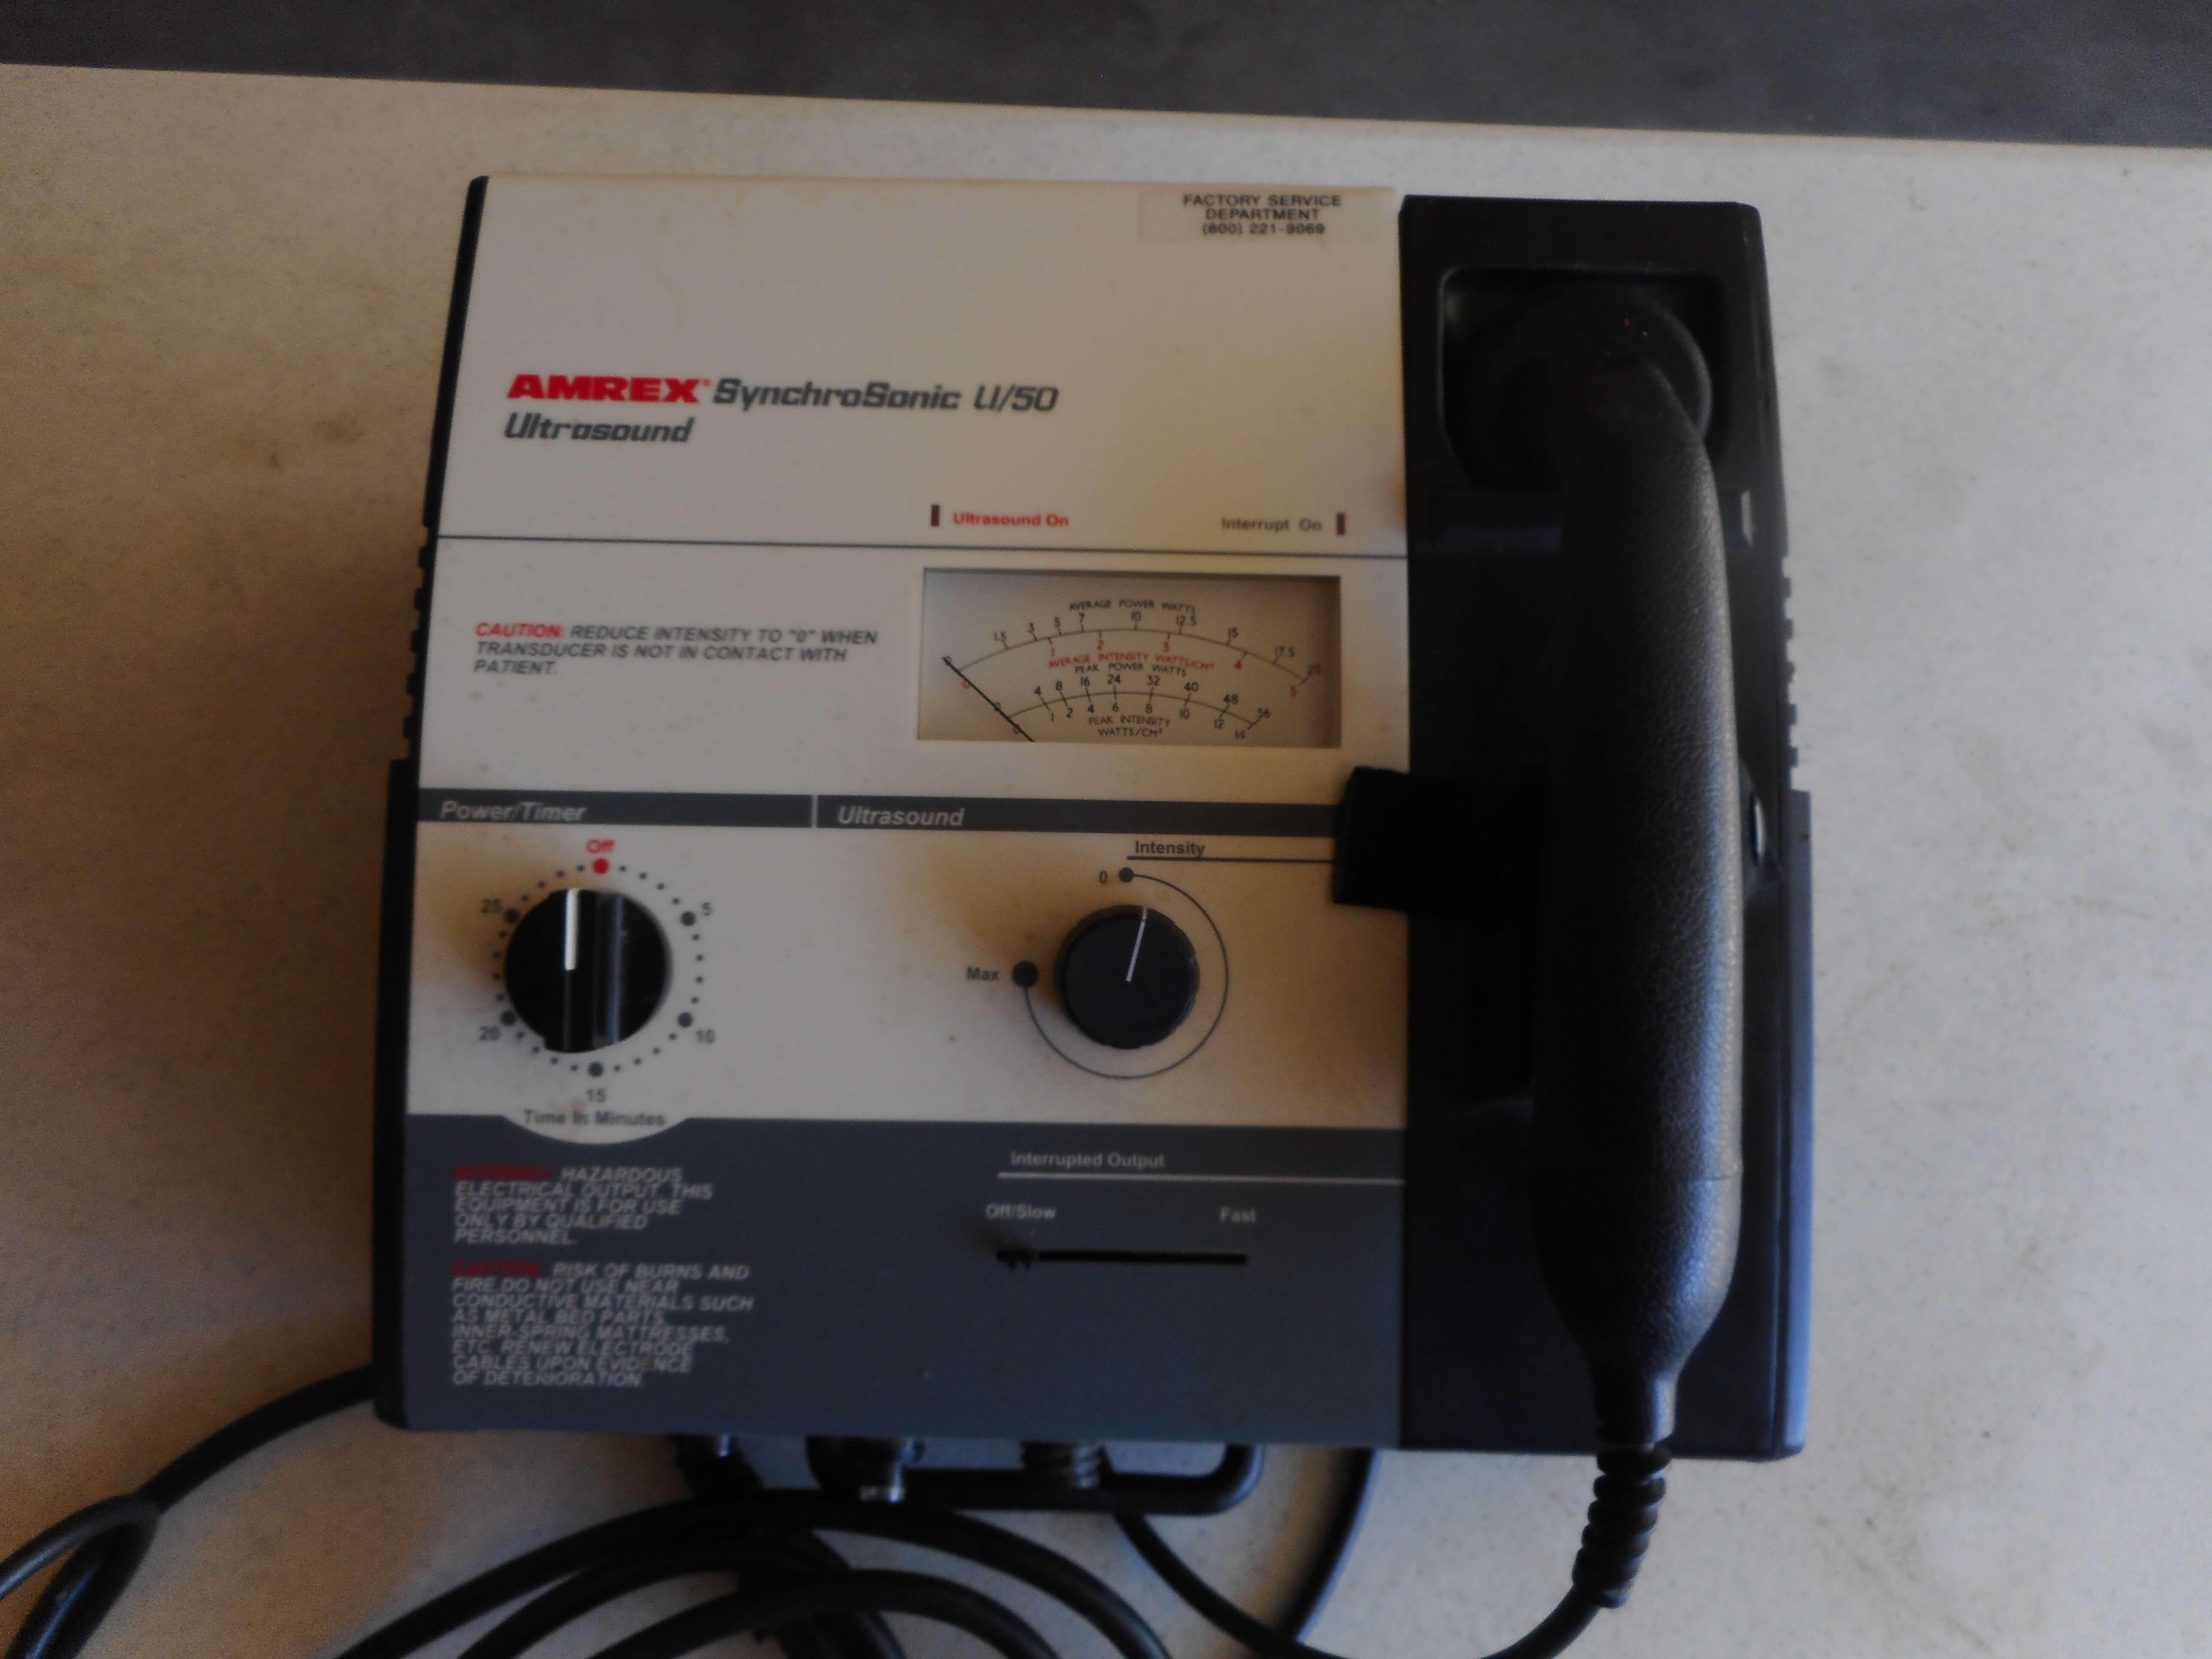 SynchroSonic U/50 Ultrasound